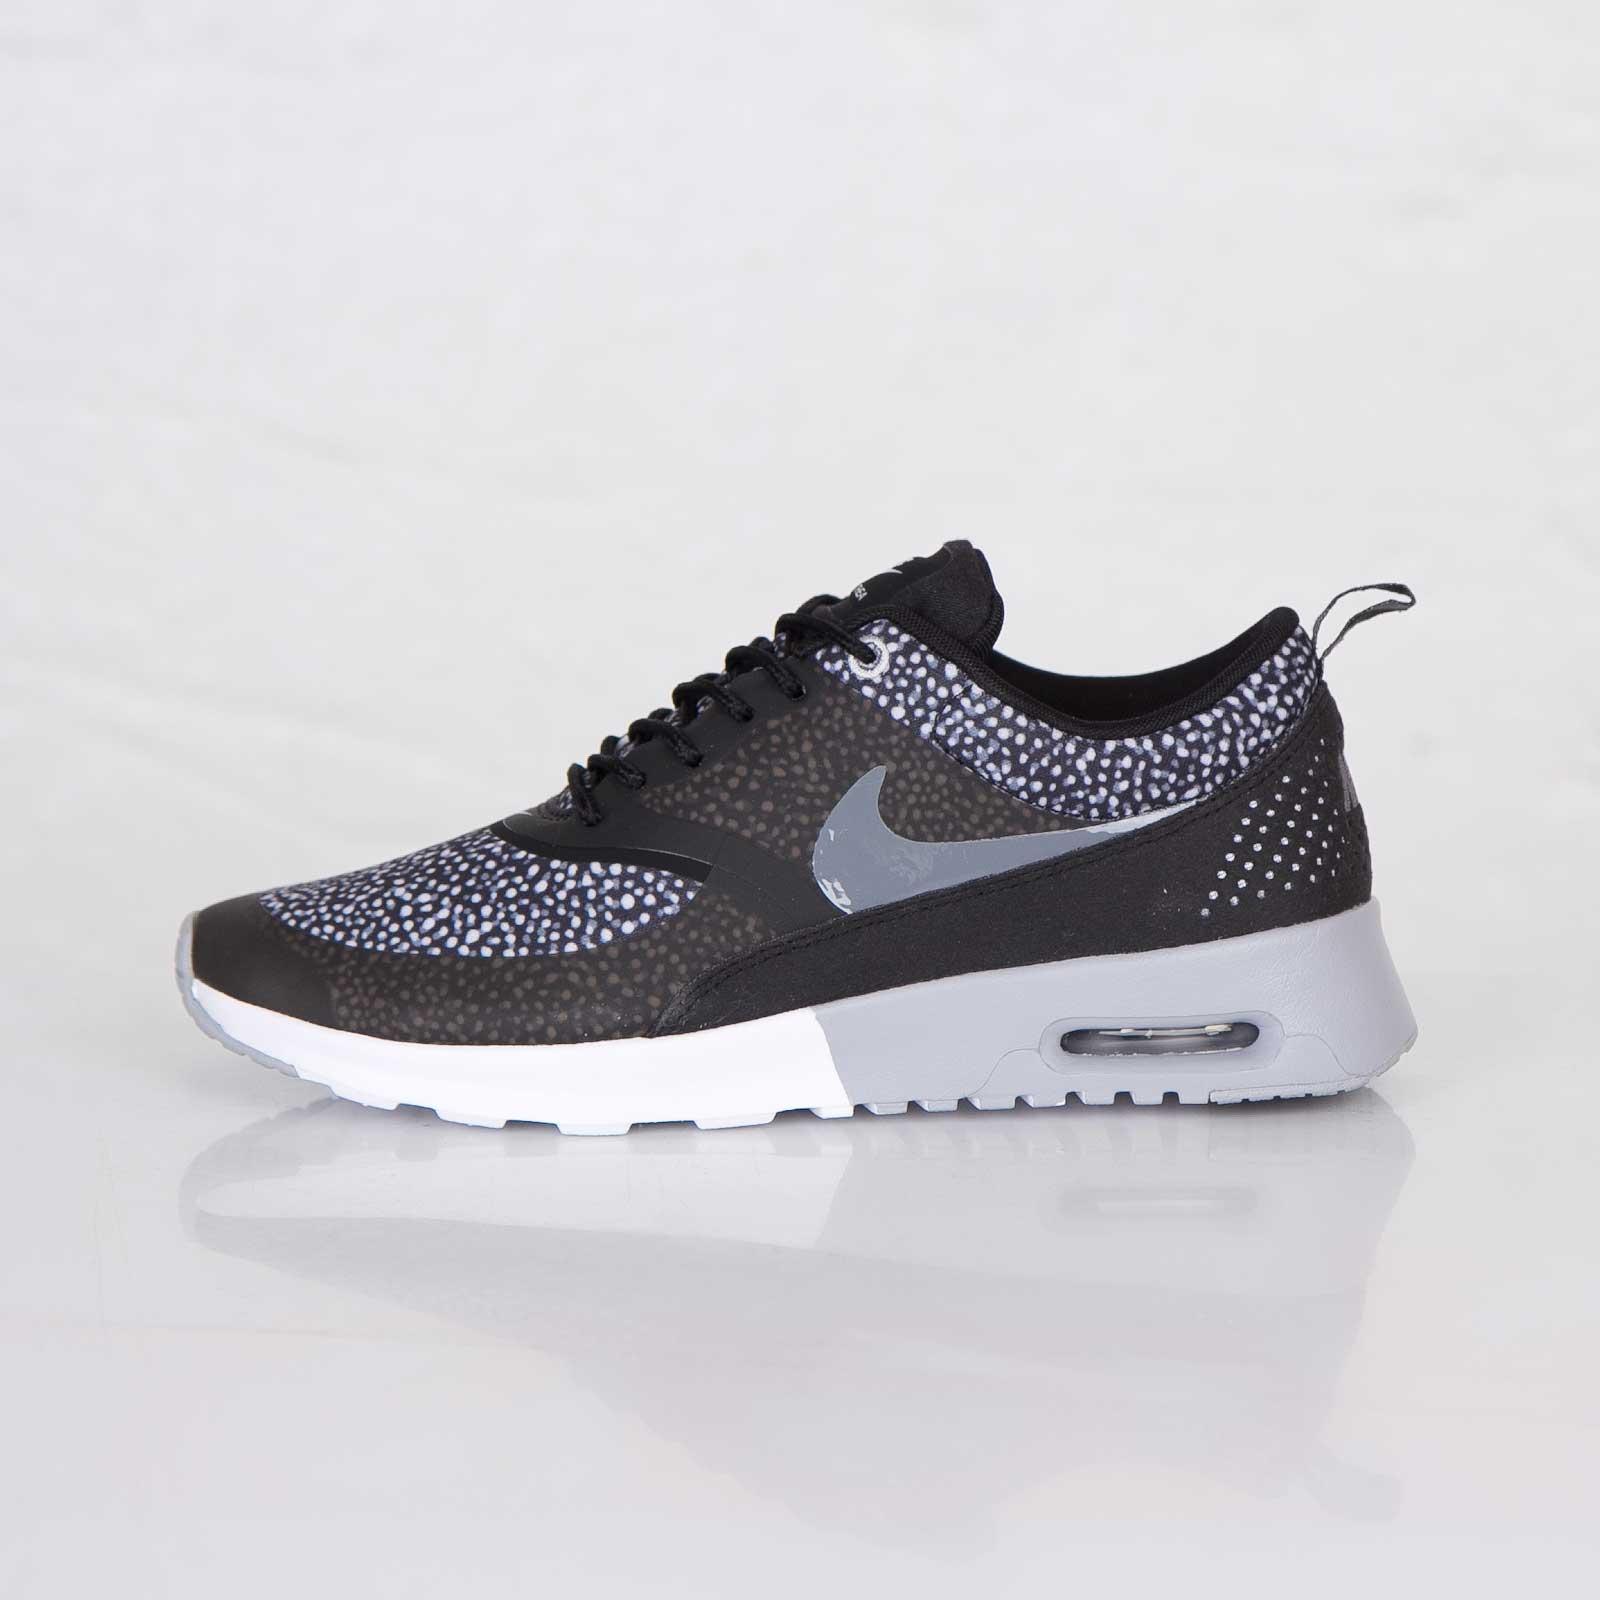 online store 57e87 32c97 Nike Wmns Air Max Thea Print - 7. Close